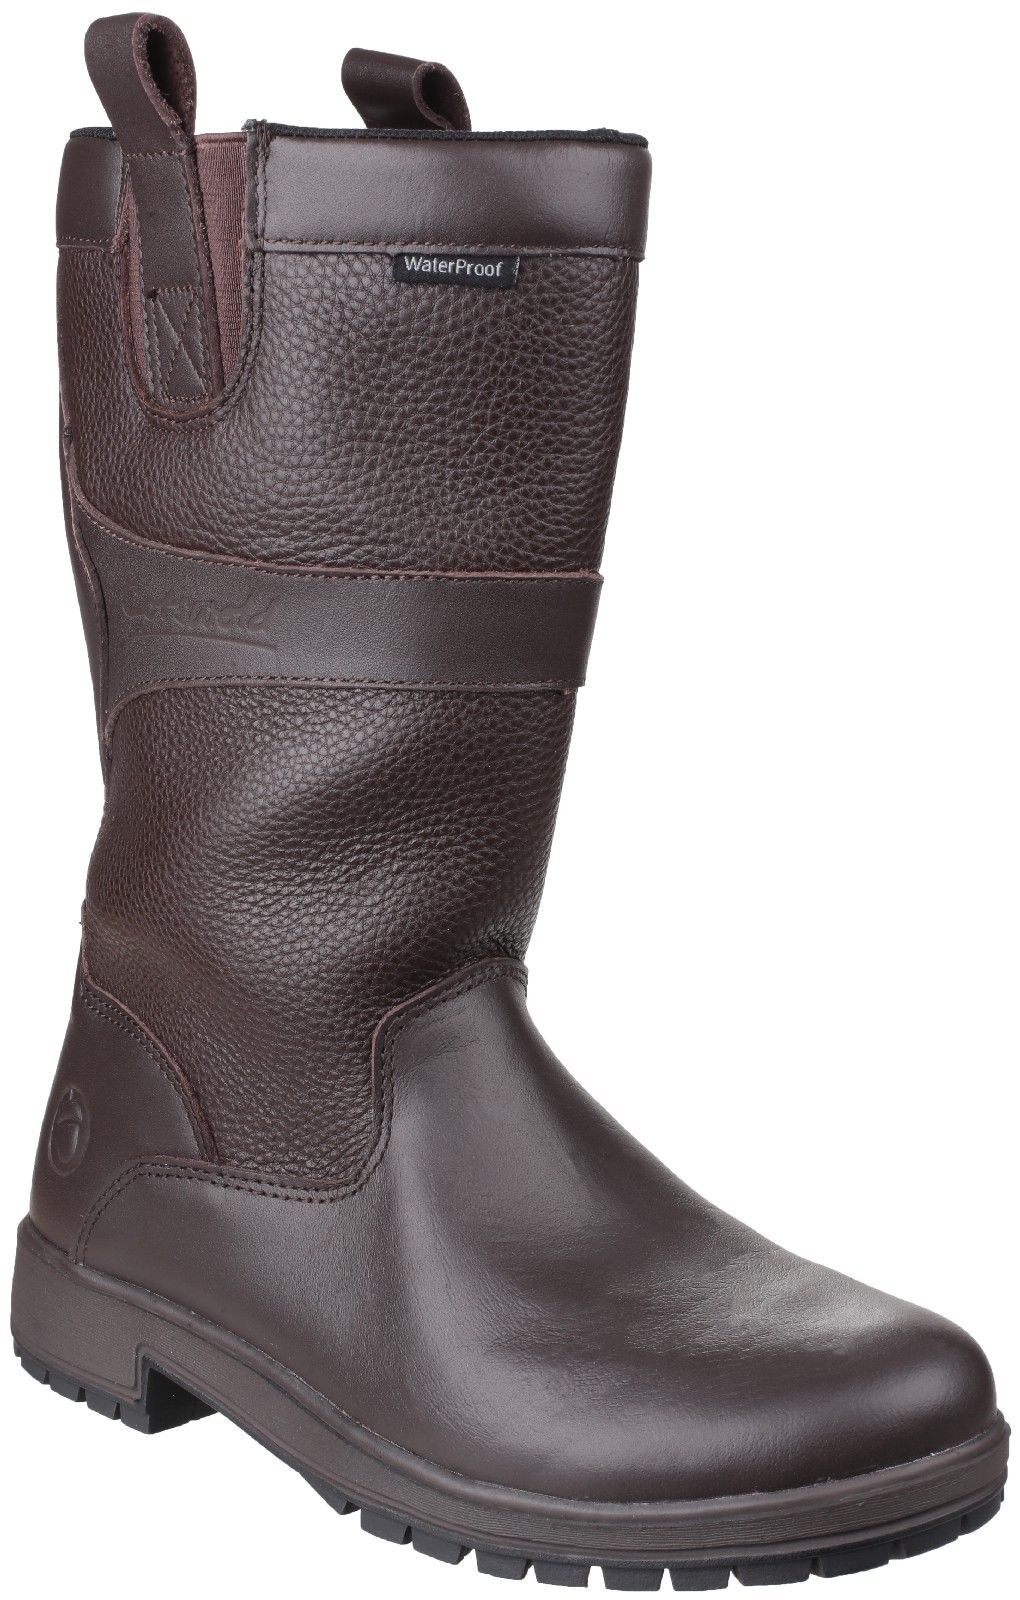 Cotswold Ascot Braun or walnut ladies Leder Stiefel waterproof pull on calf Stiefel Leder dda2d8